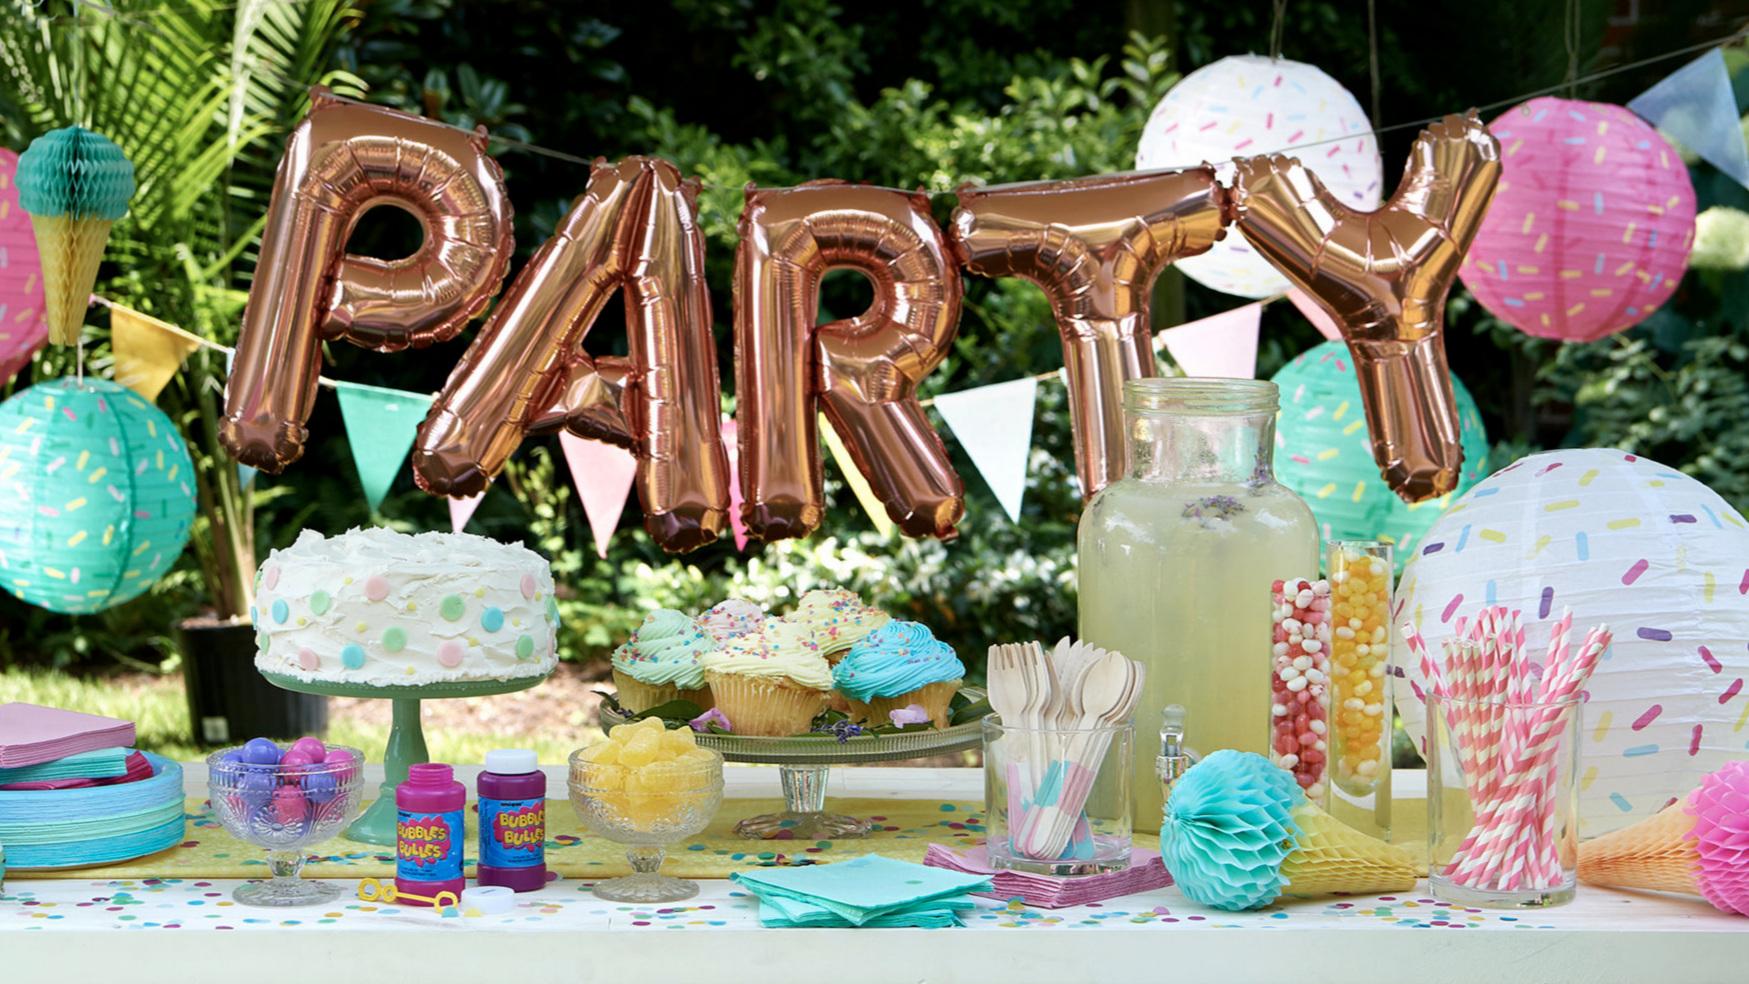 45524_Beattheheat_ENT_PartySupplies_Decorations17097_Horz.jpg